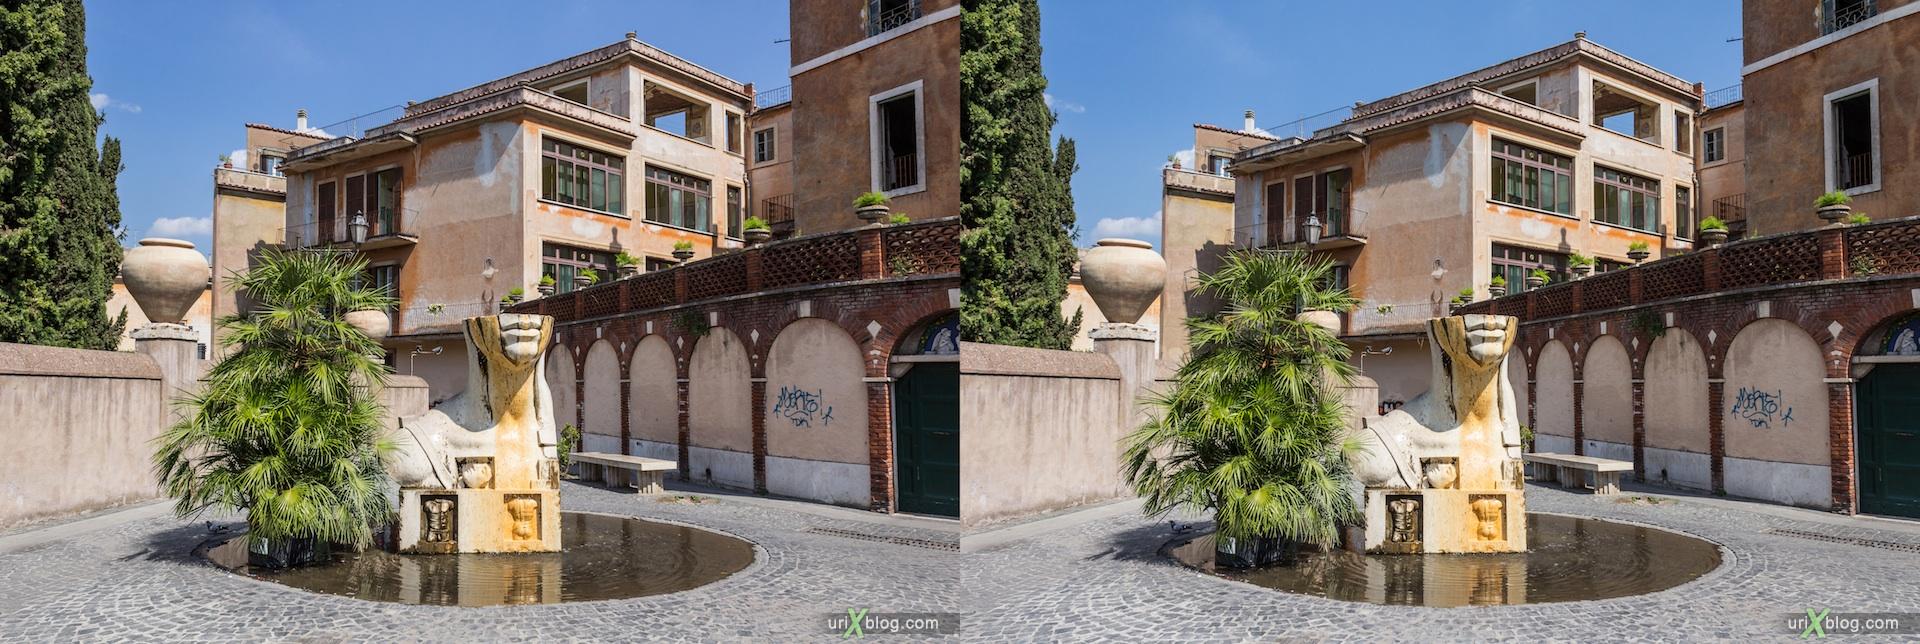 2012, villa D'Este, Tivoli, Italy, fountain, 3D, stereo pair, cross-eyed, crossview